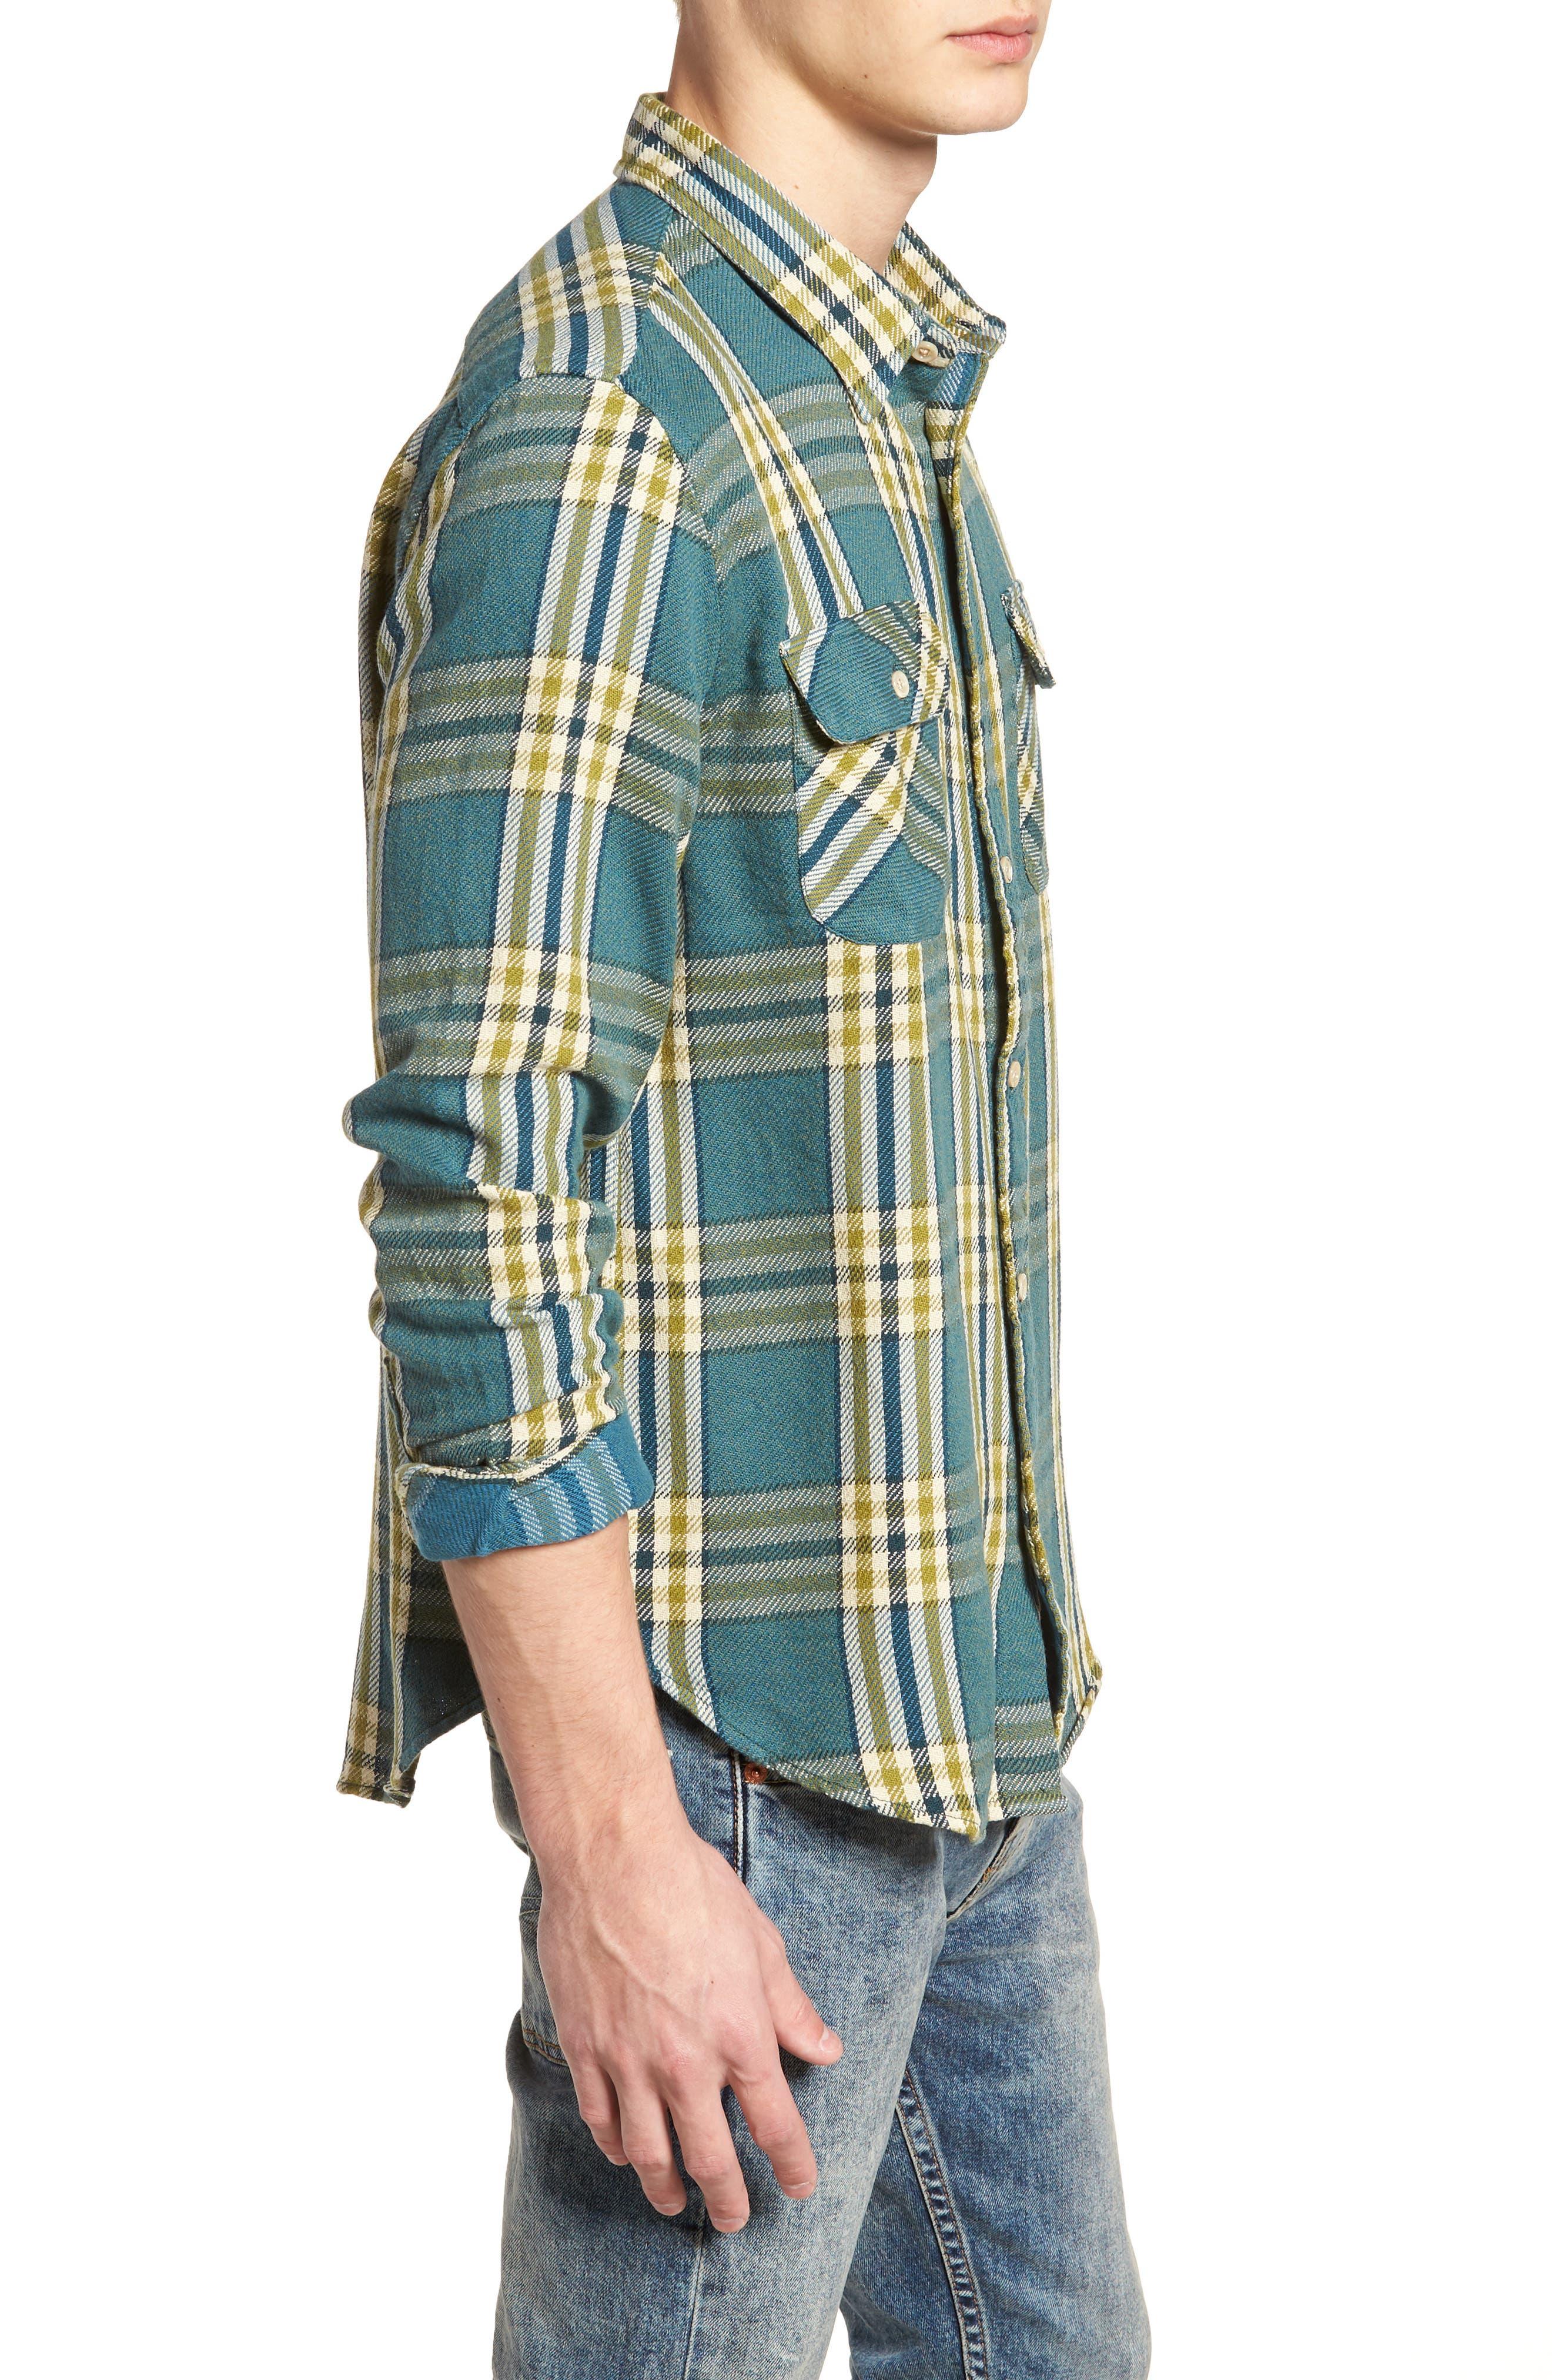 Shorthorn Western Shirt,                             Alternate thumbnail 4, color,                             Under Water Blue Multi